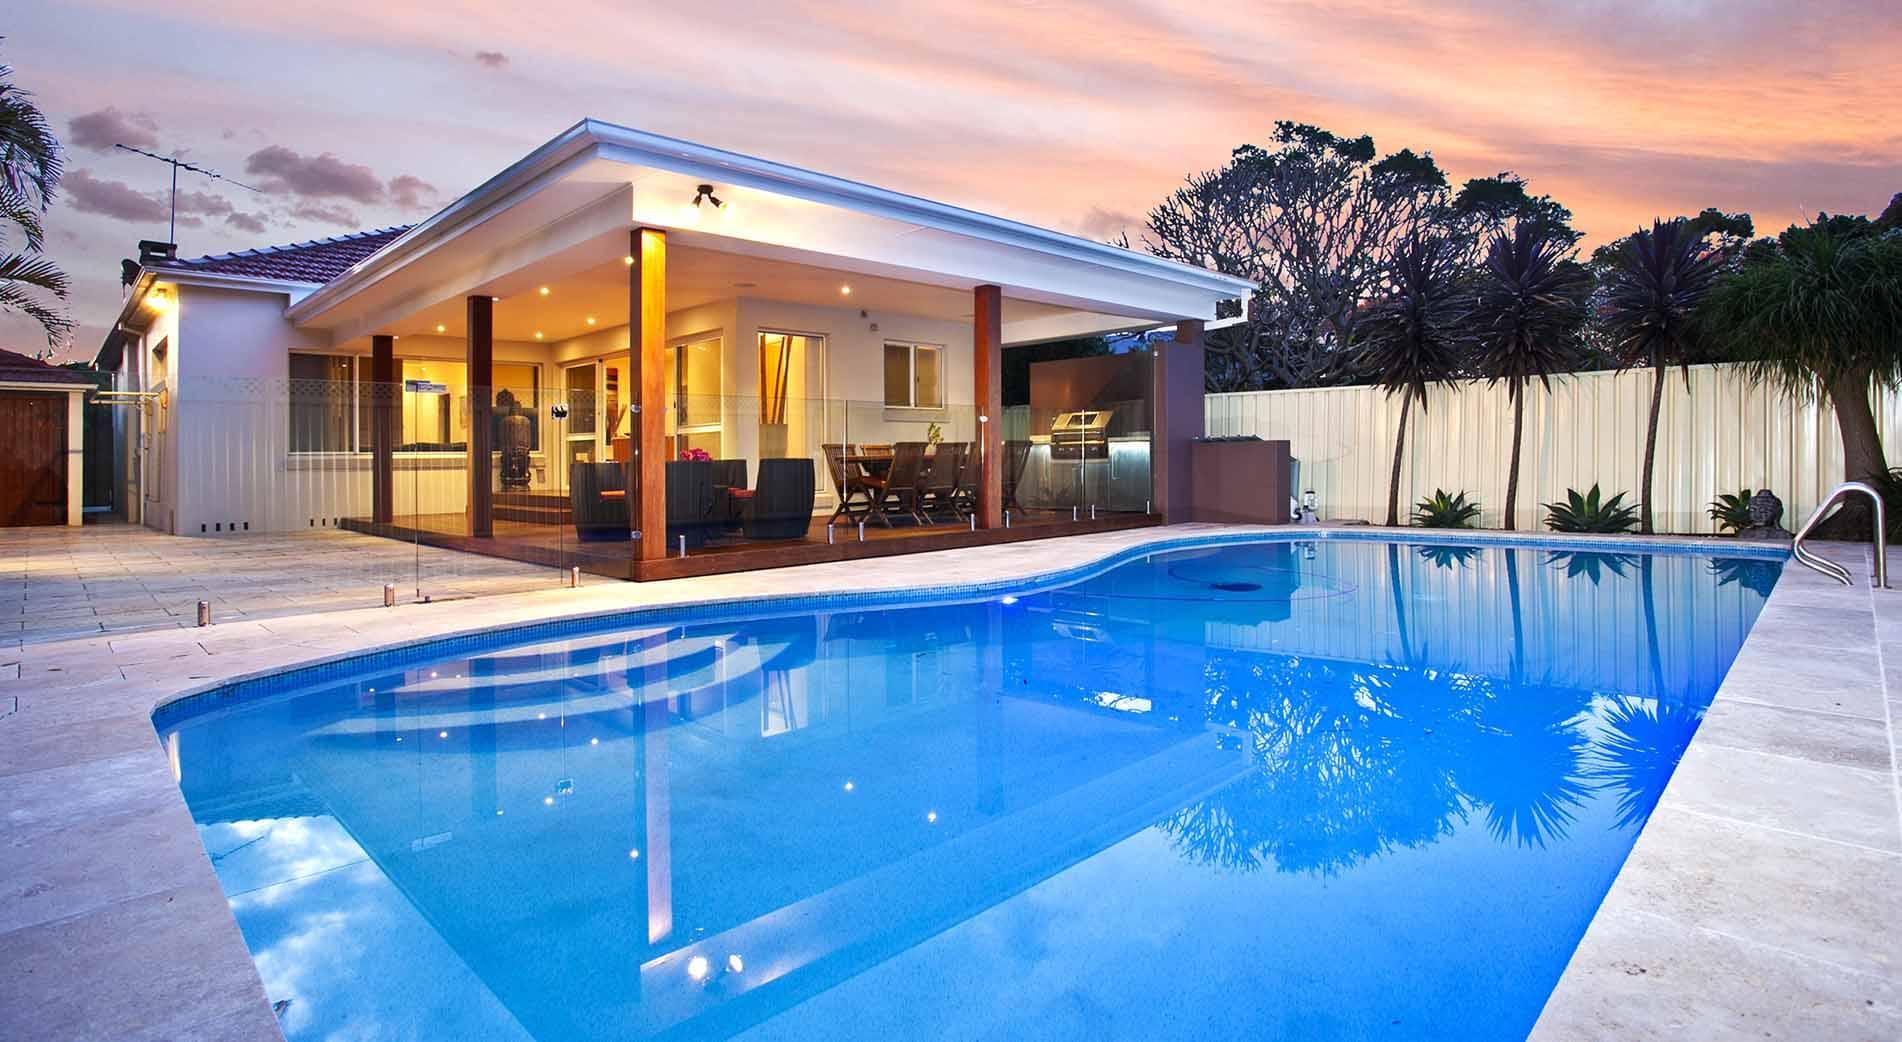 PAmerican Pool Plastering Services